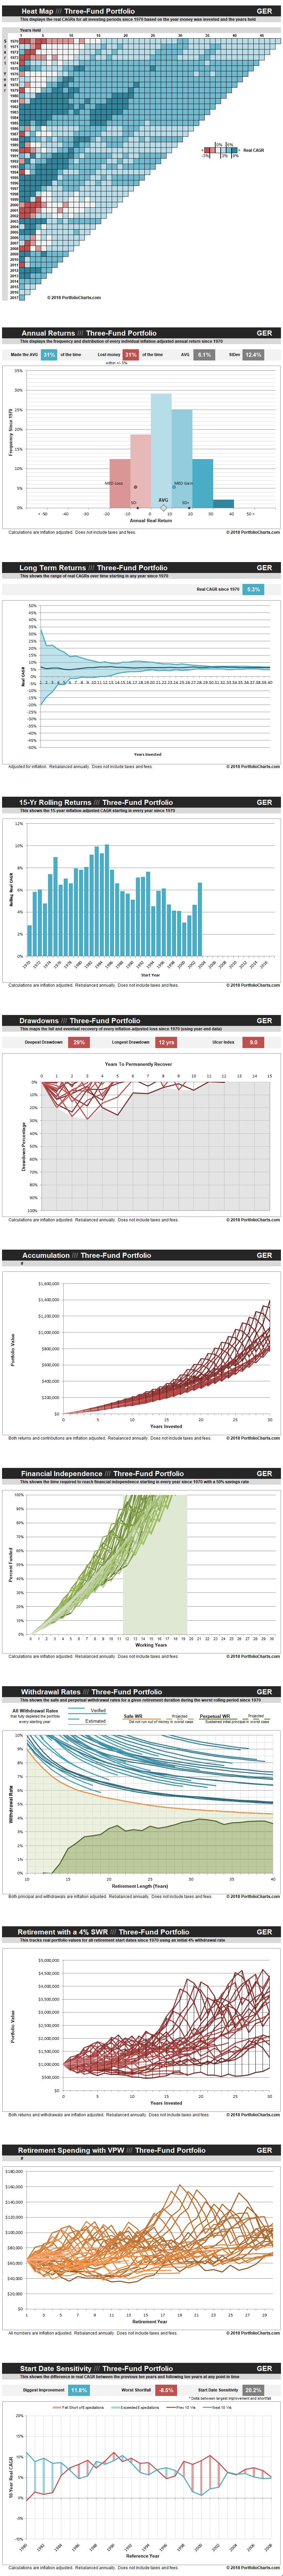 three-fund-portfolio-GER-20180508